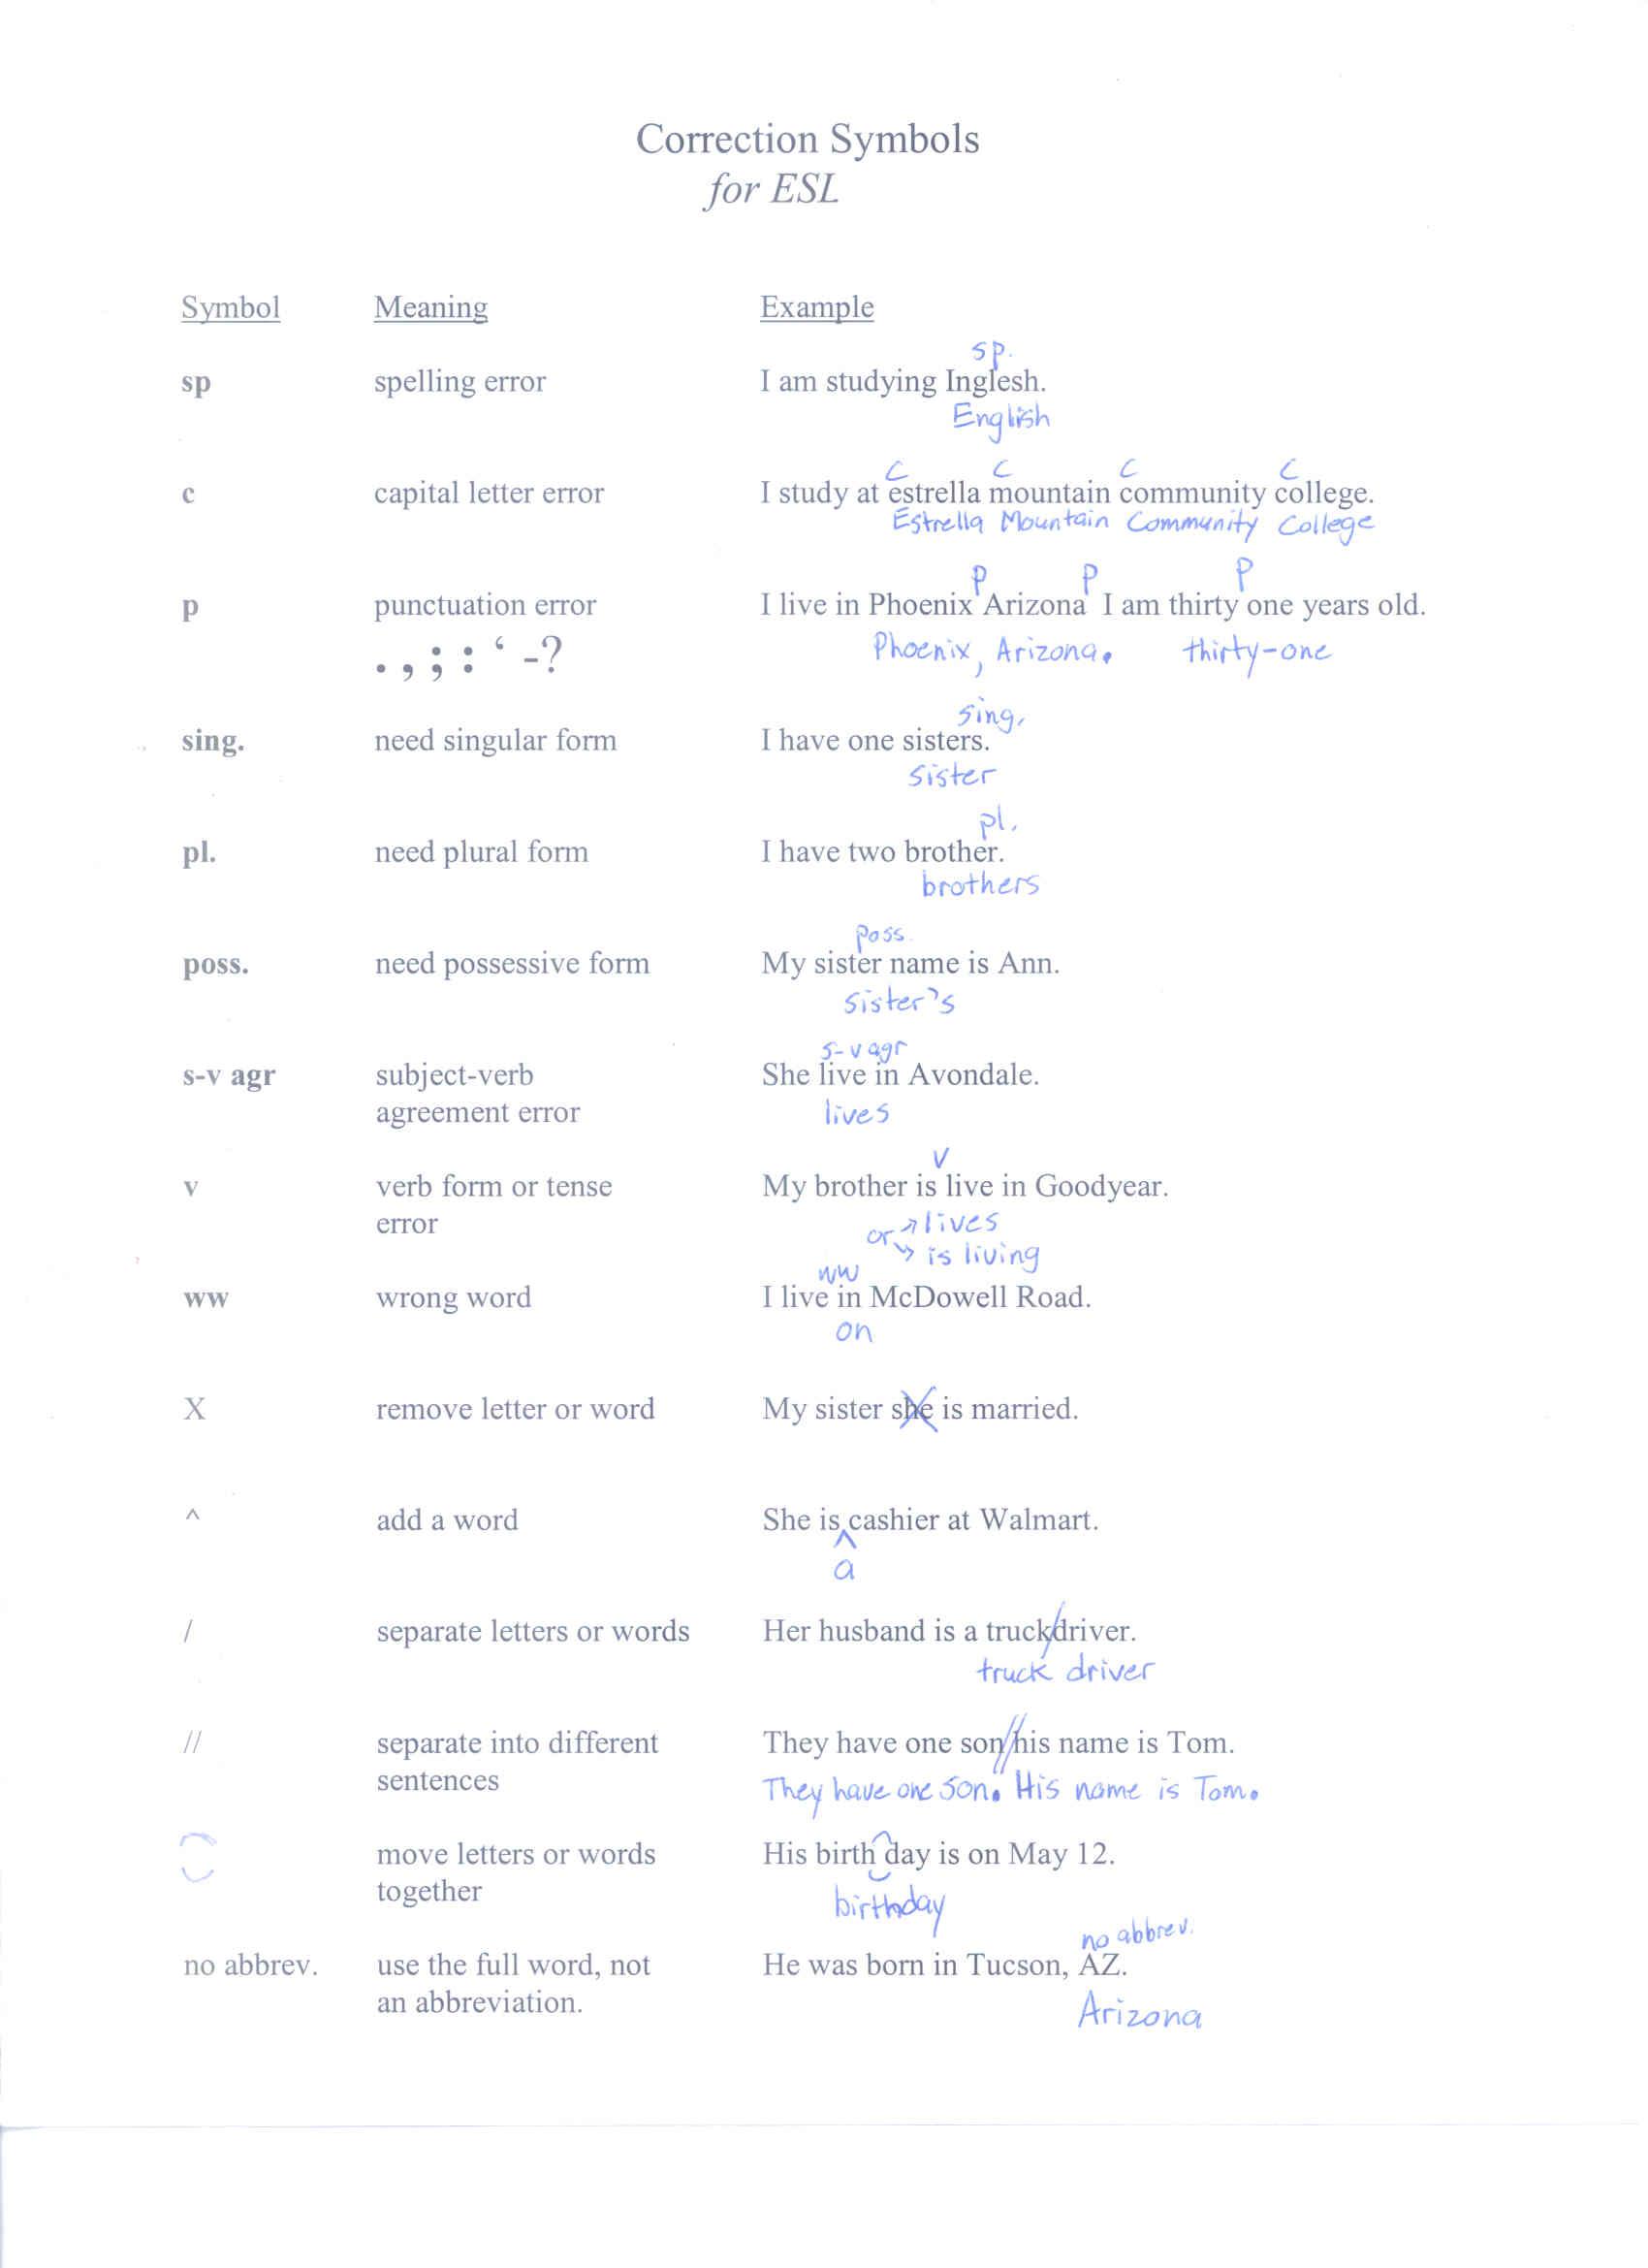 006 Editing20symbols Essay Example Spanish Remarkable Checker Full